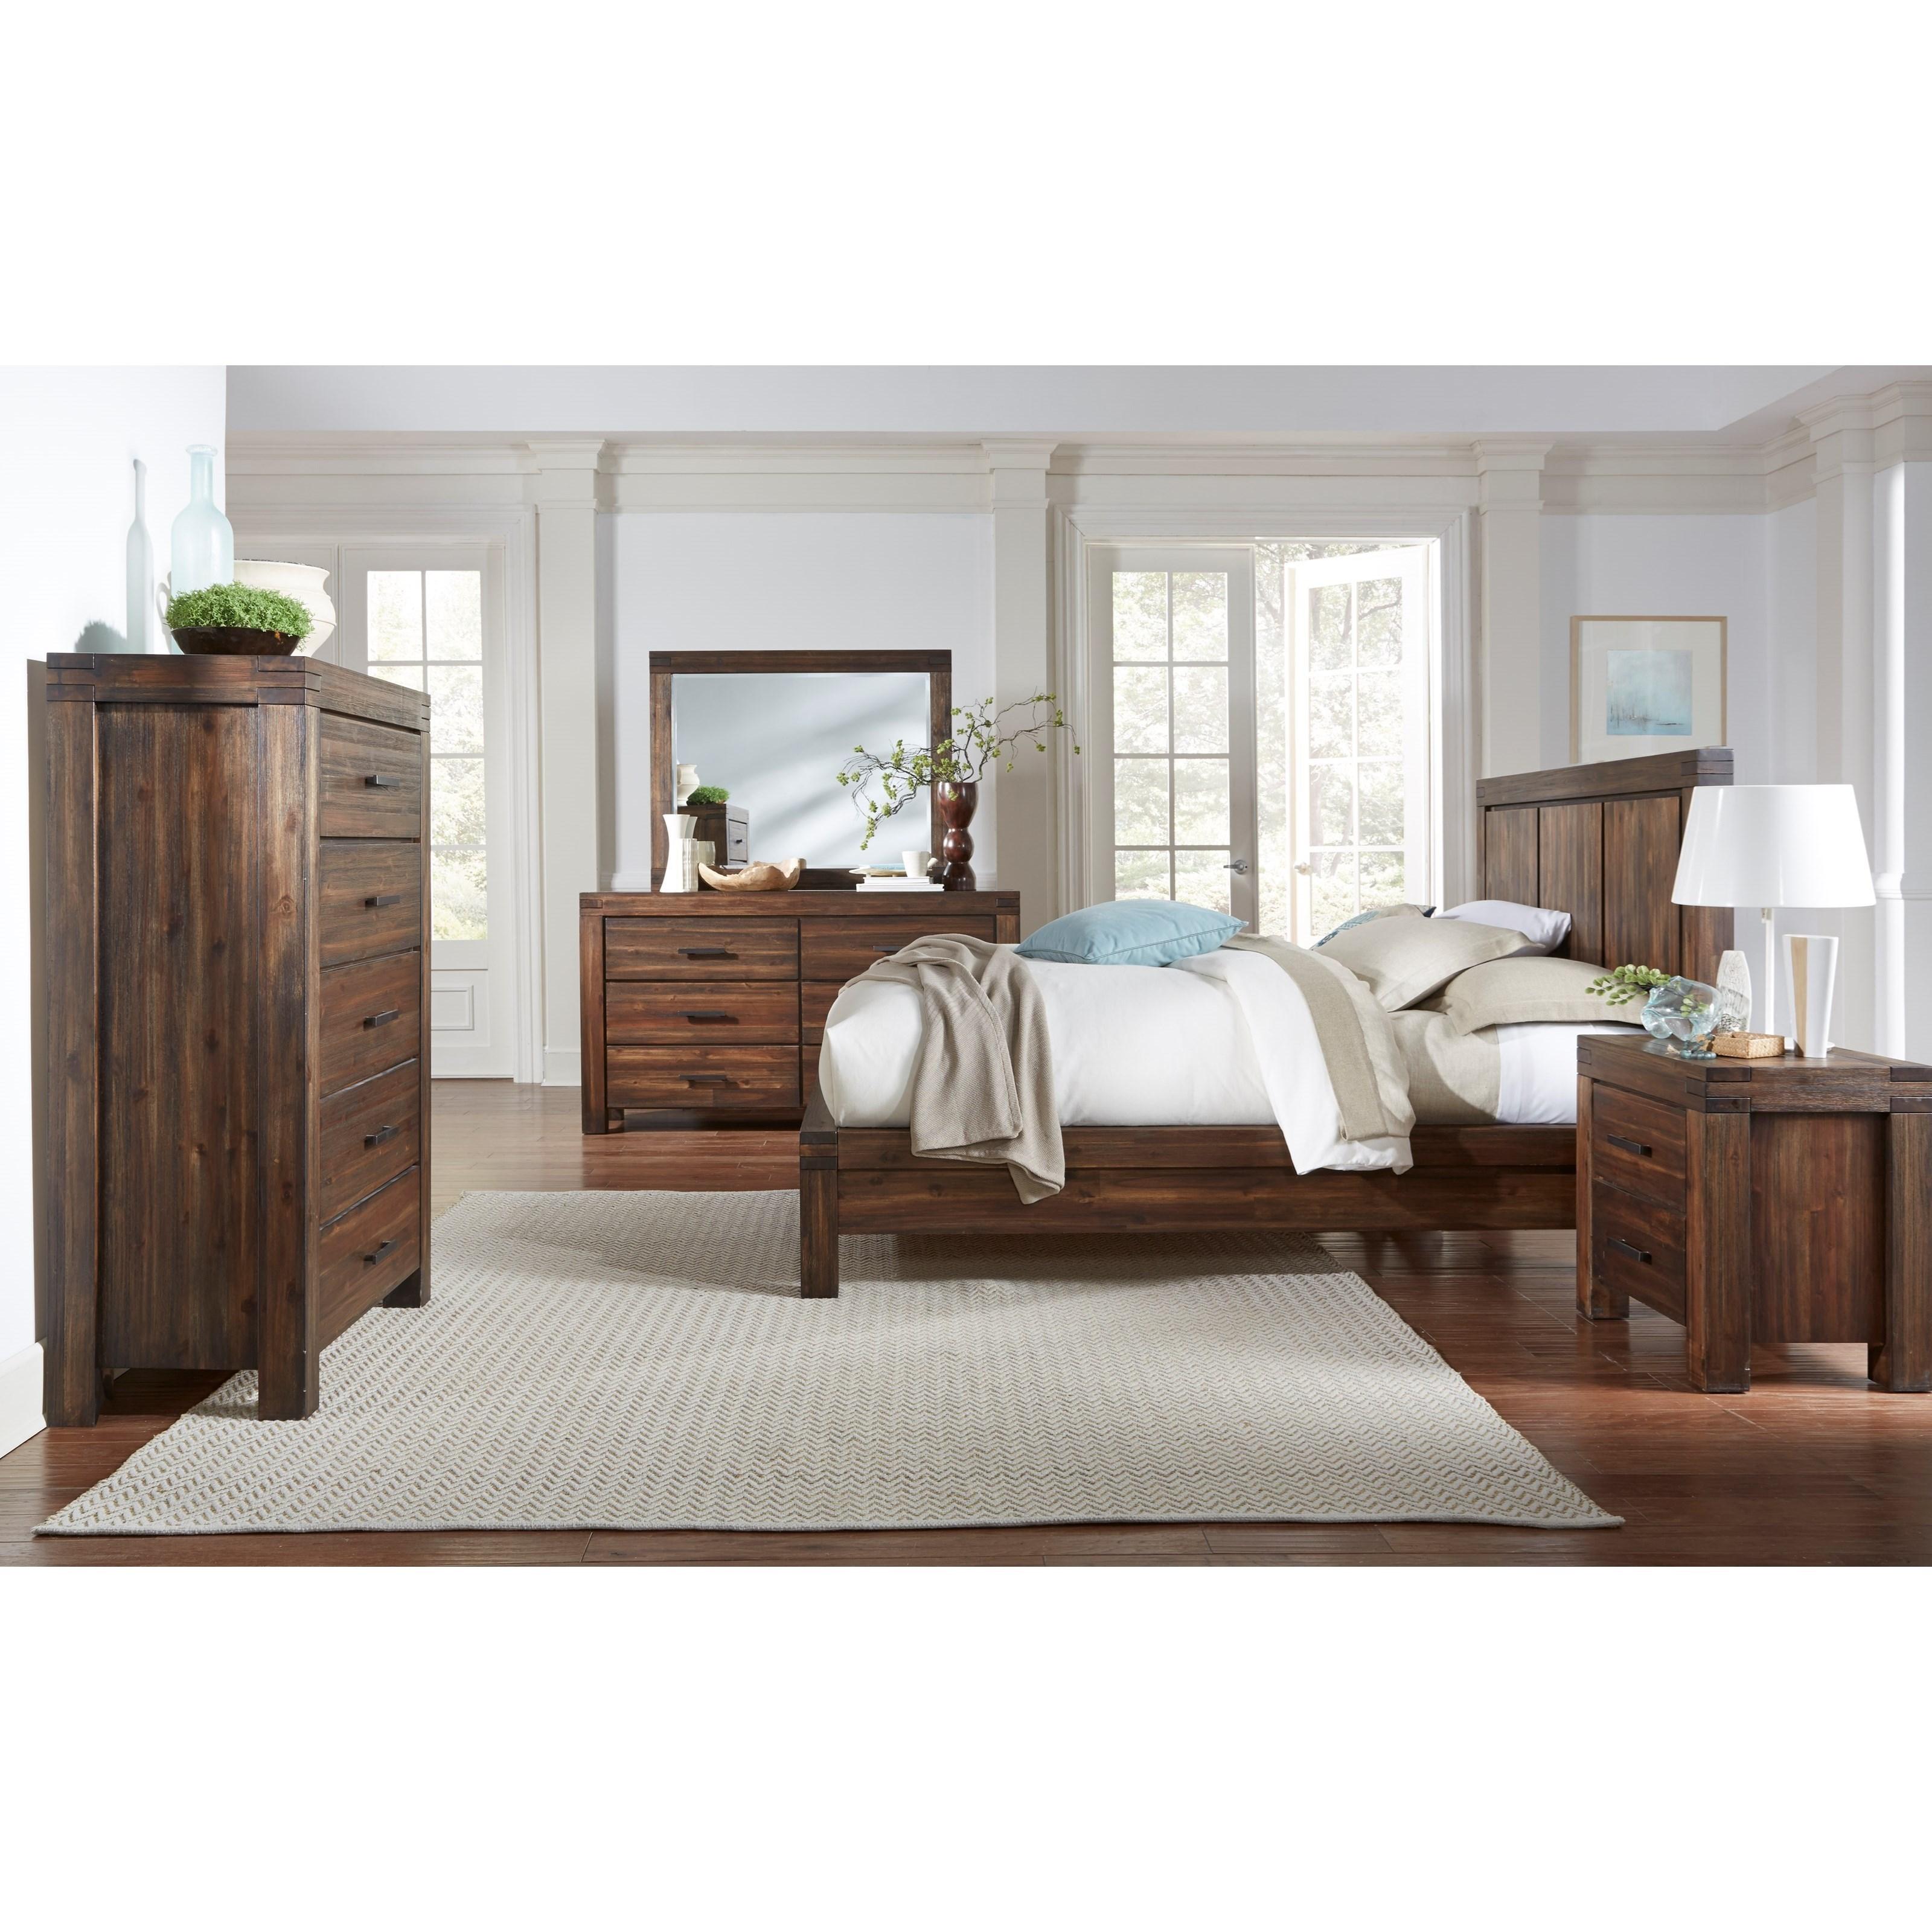 12063 California King Bedroom Group at Sadler's Home Furnishings